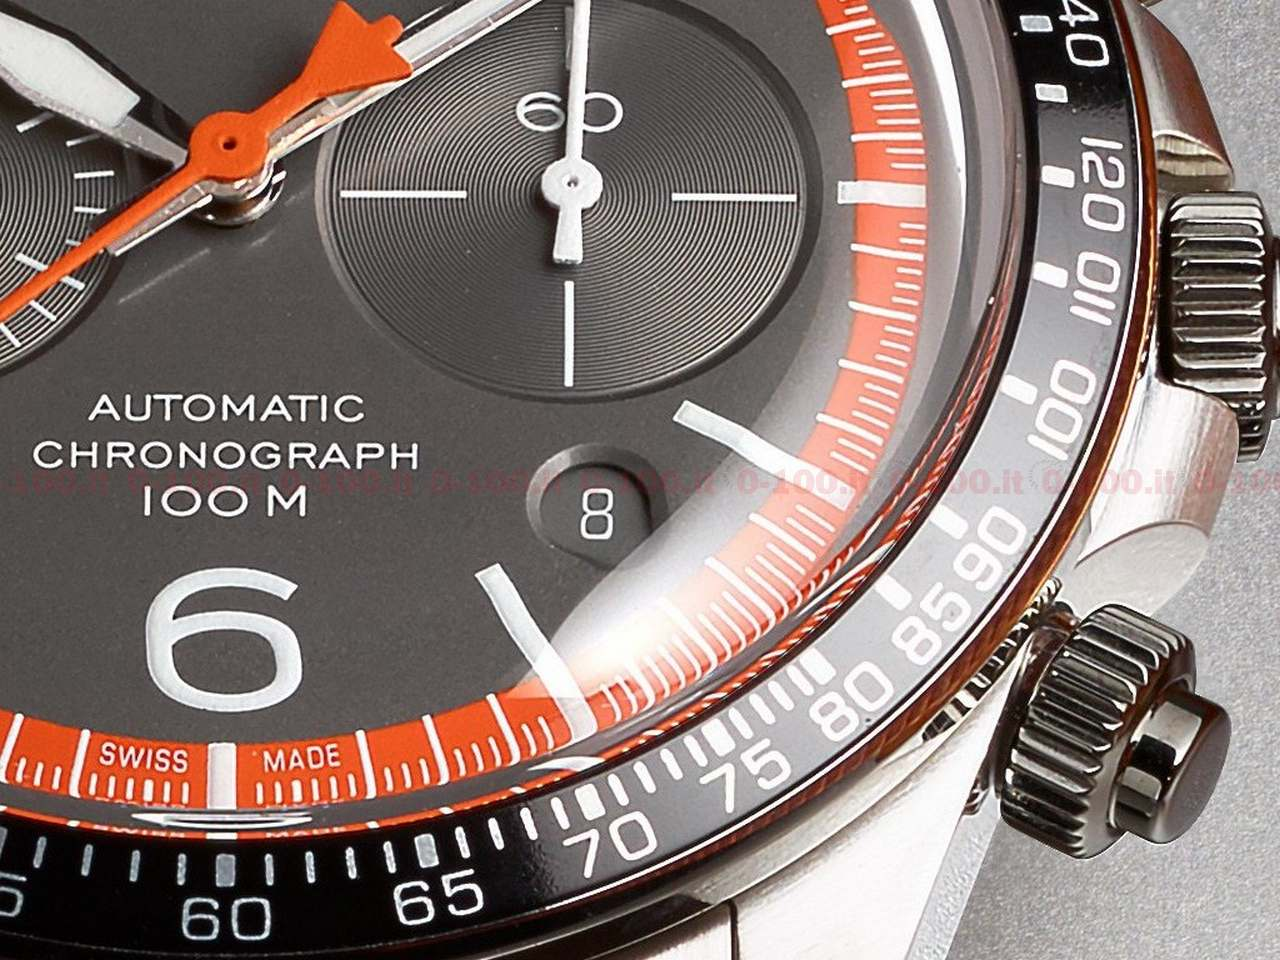 Bell & Ross BR V2-94 Garde-Côtes cronografo_0-1005